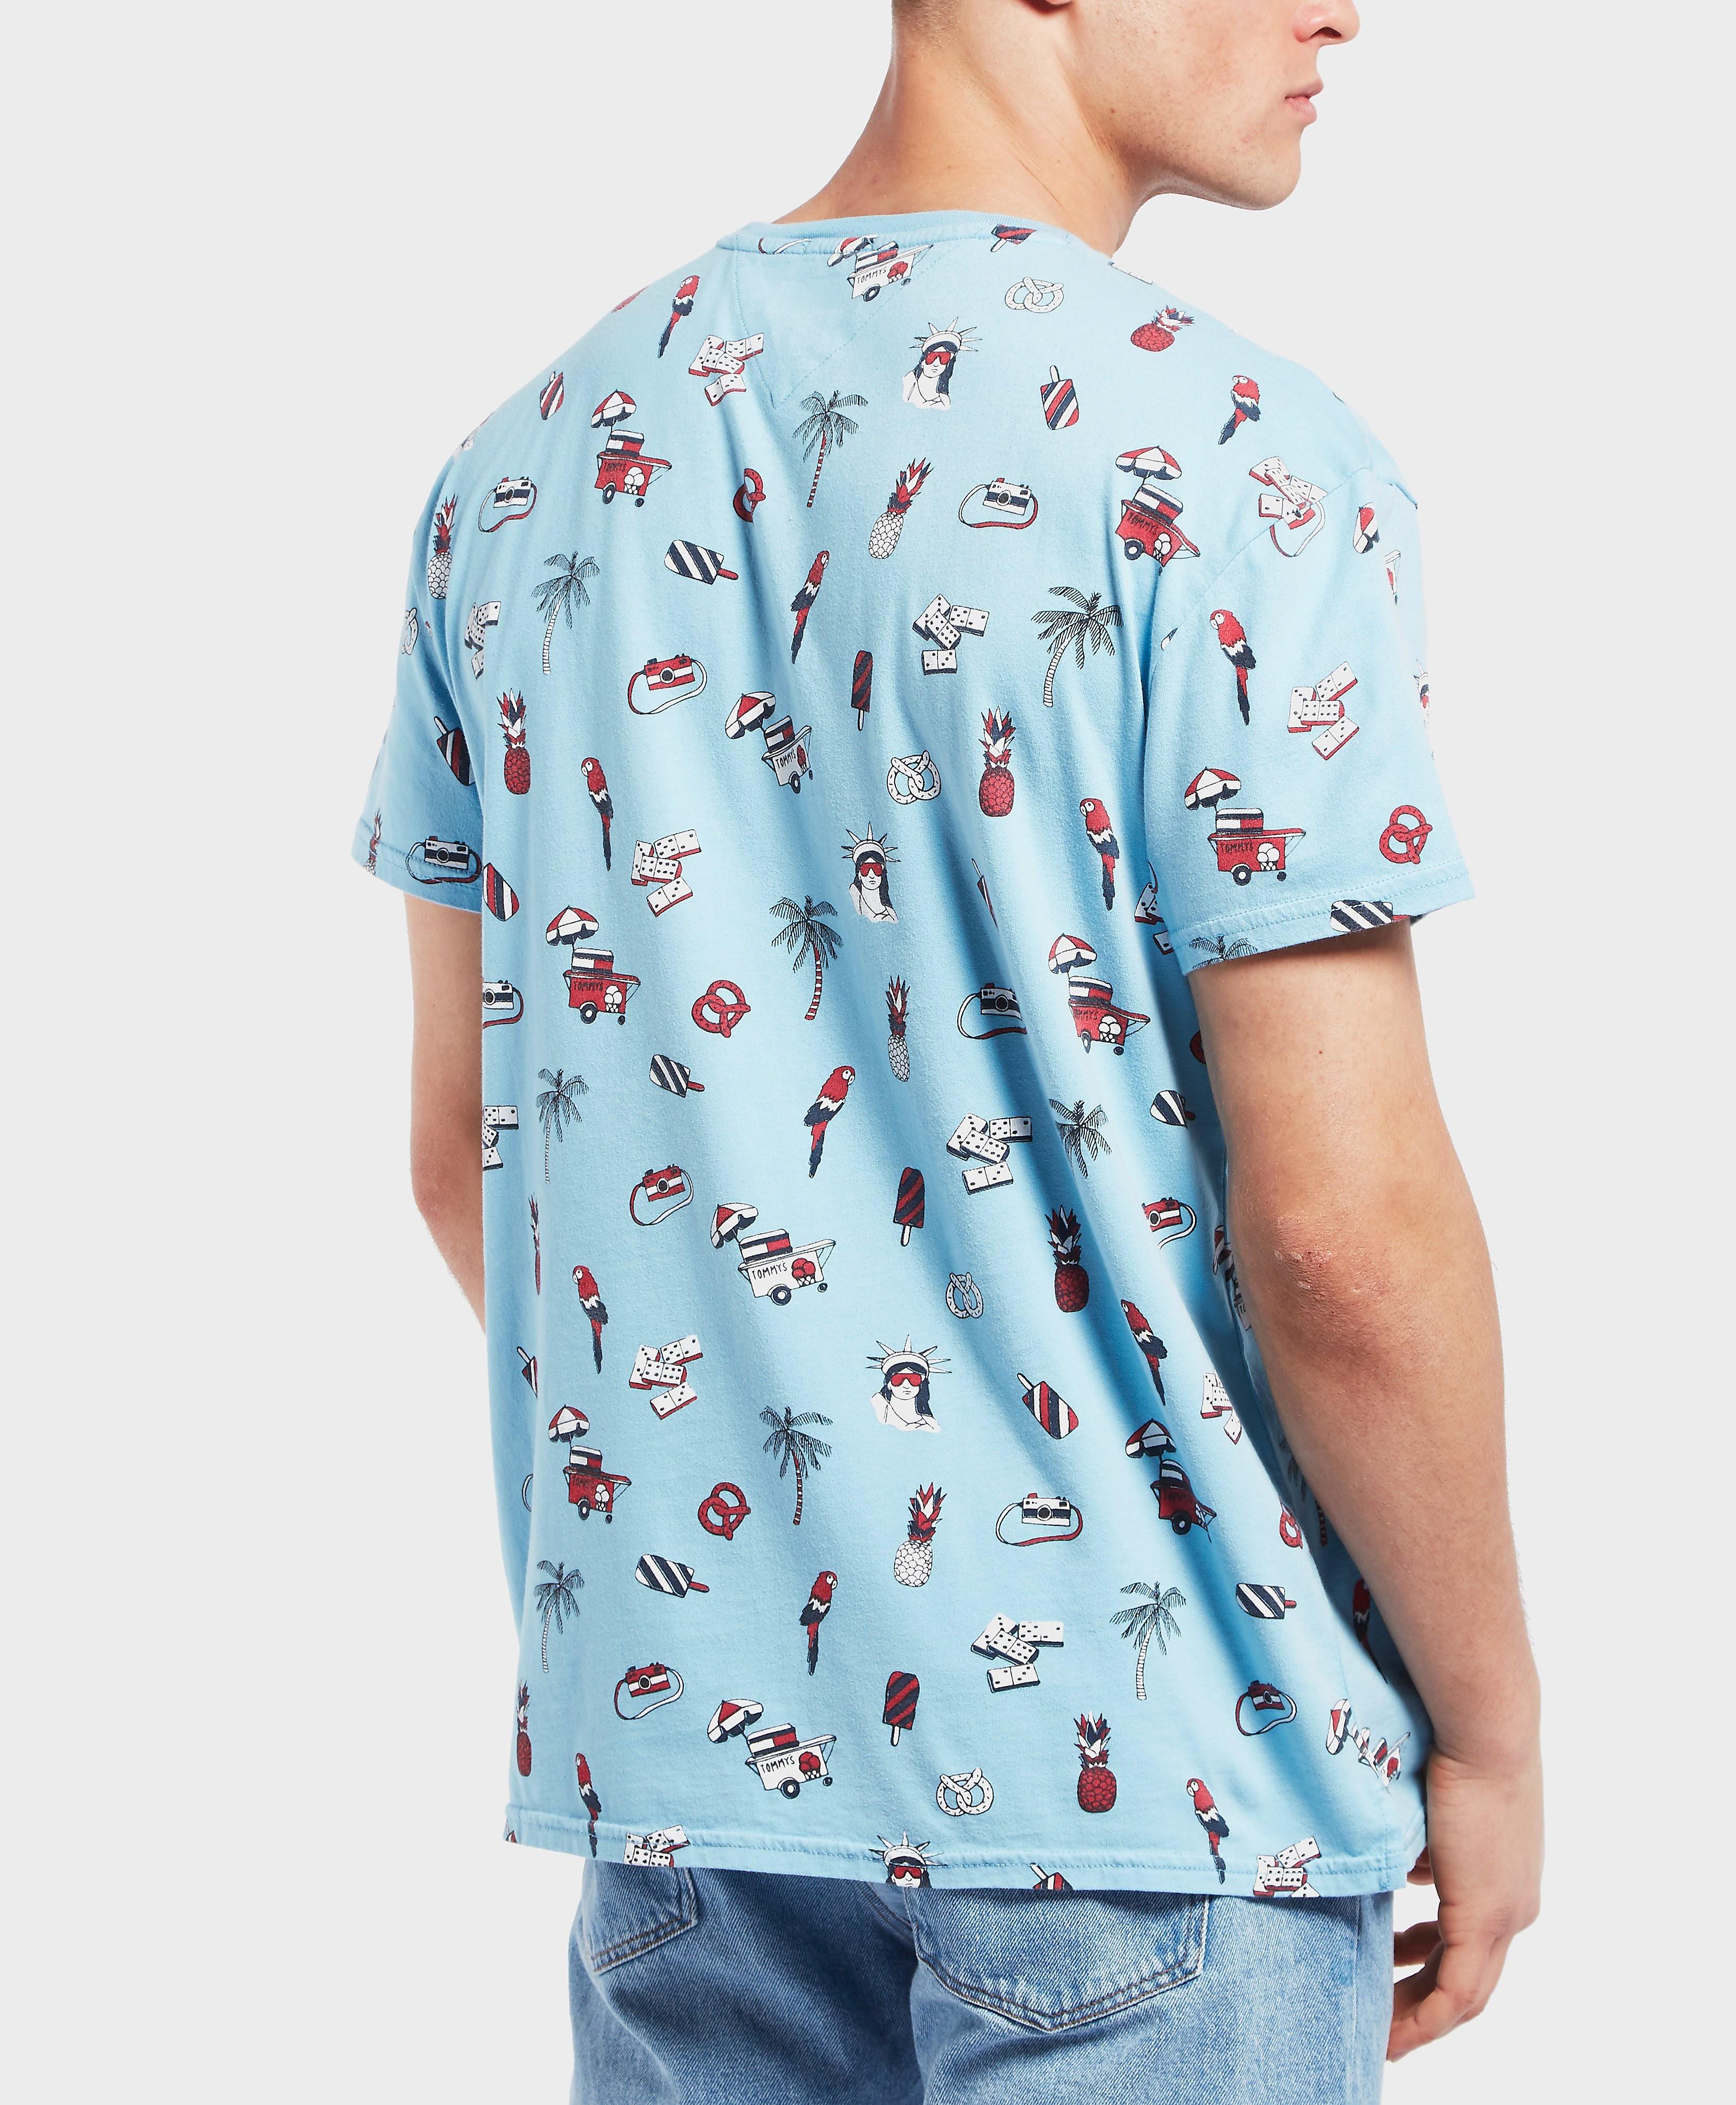 Tommy Hilfiger Ice Cream Print Short Sleeve T-Shirt